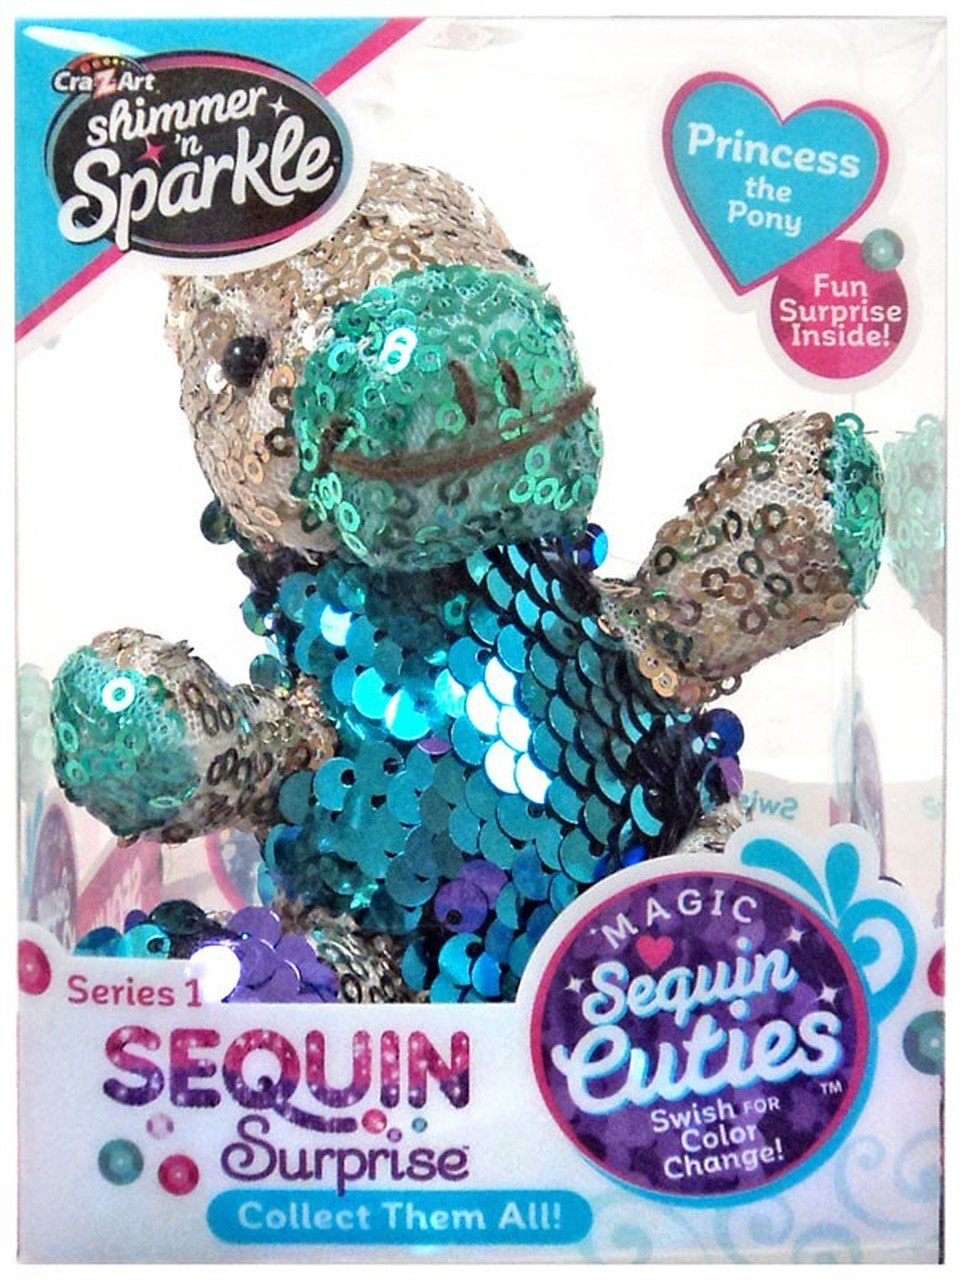 Shimmer 'n Sparkle Magic Sequin Cuties Sequin Surprise Series 1 Princess the Pony Mini Plush